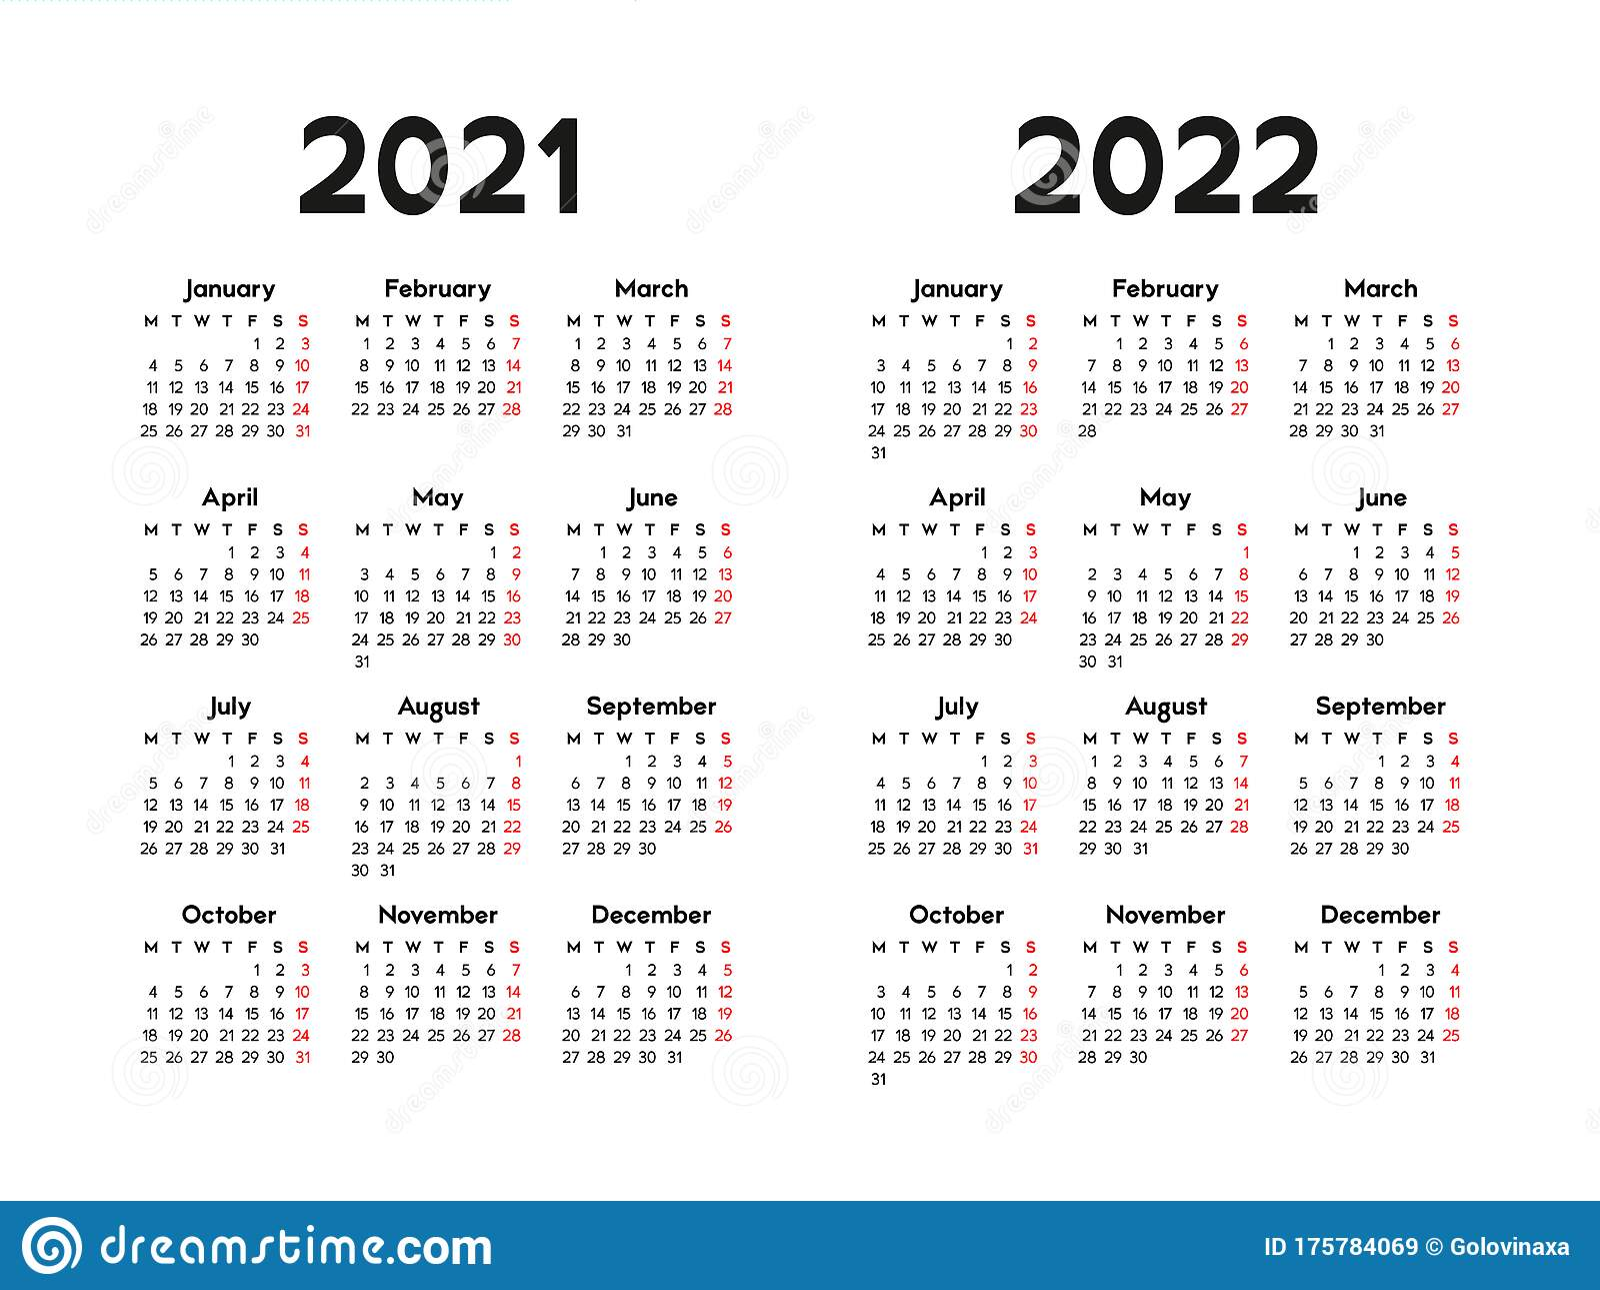 2022 Calendar Monday Start.Calendar 2021 And 2022 Week Starts On Monday Basic Business Template Stock Vector Illustration Of Pocket 2021 175784069